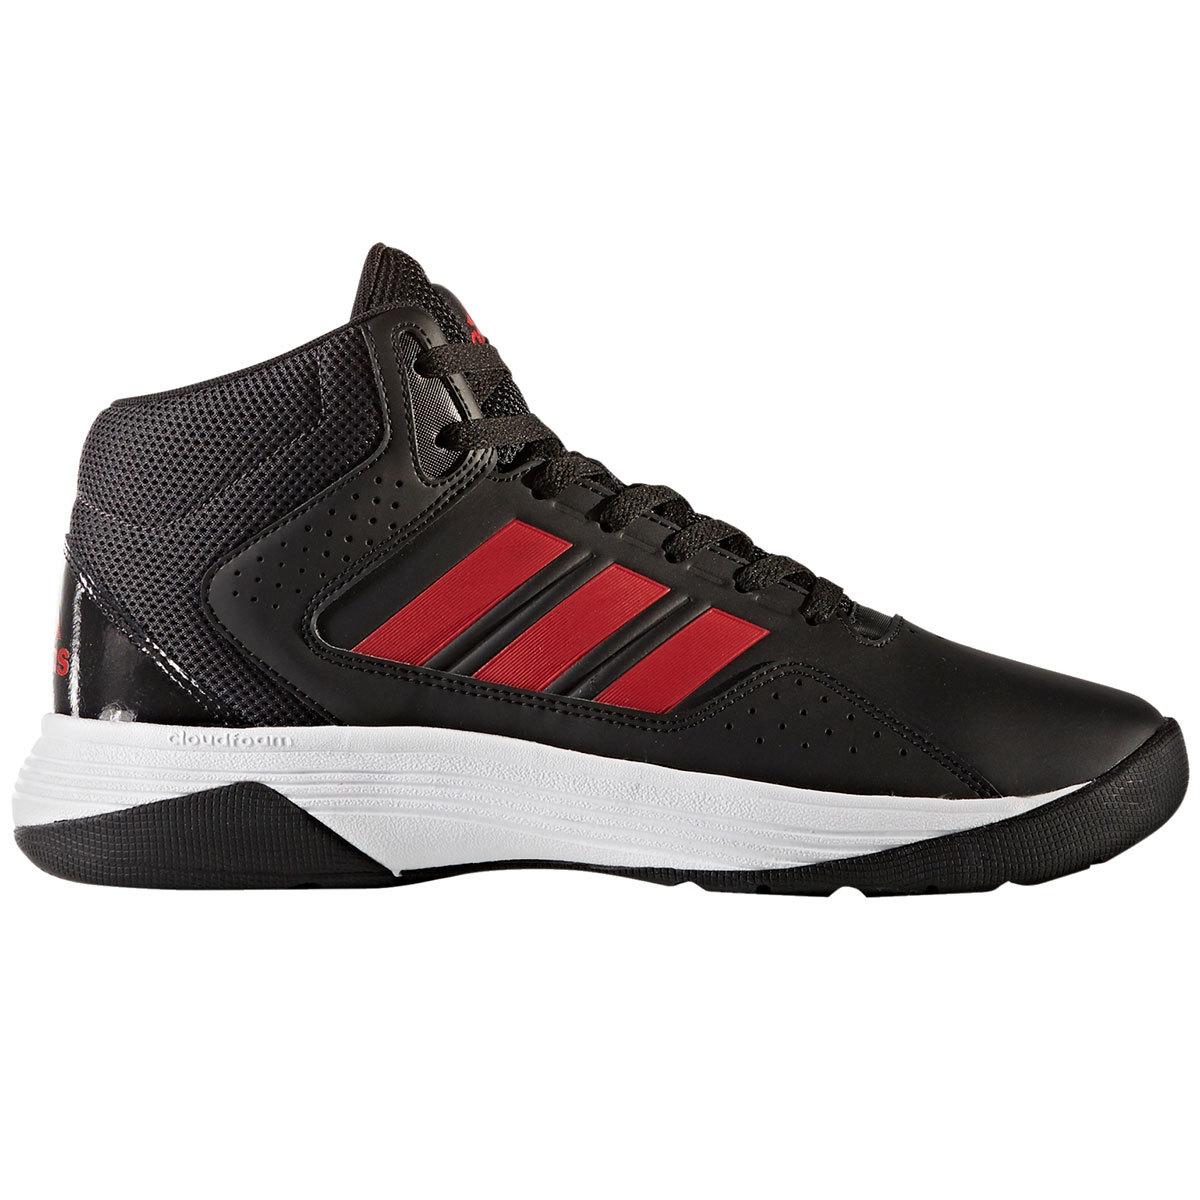 ADIDAS Men's Neo Cloudfoam Ilation Mid Basketball Shoes, Black/Scarlet